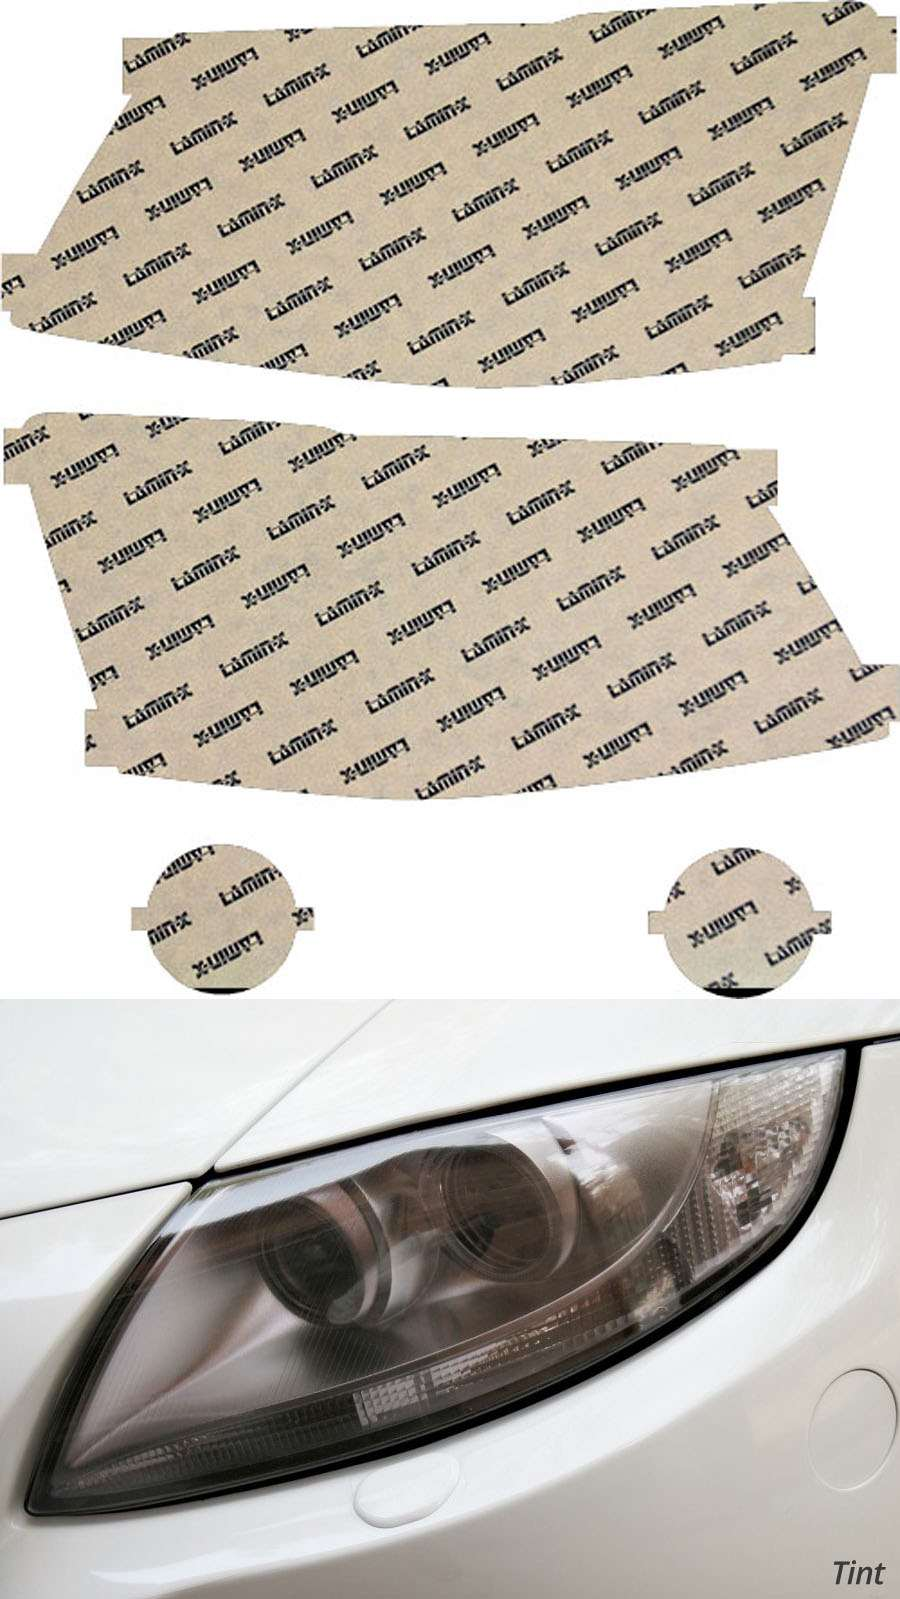 Dodge Grand Caravan 08-10 Tint Headlight Covers Lamin-X D019T